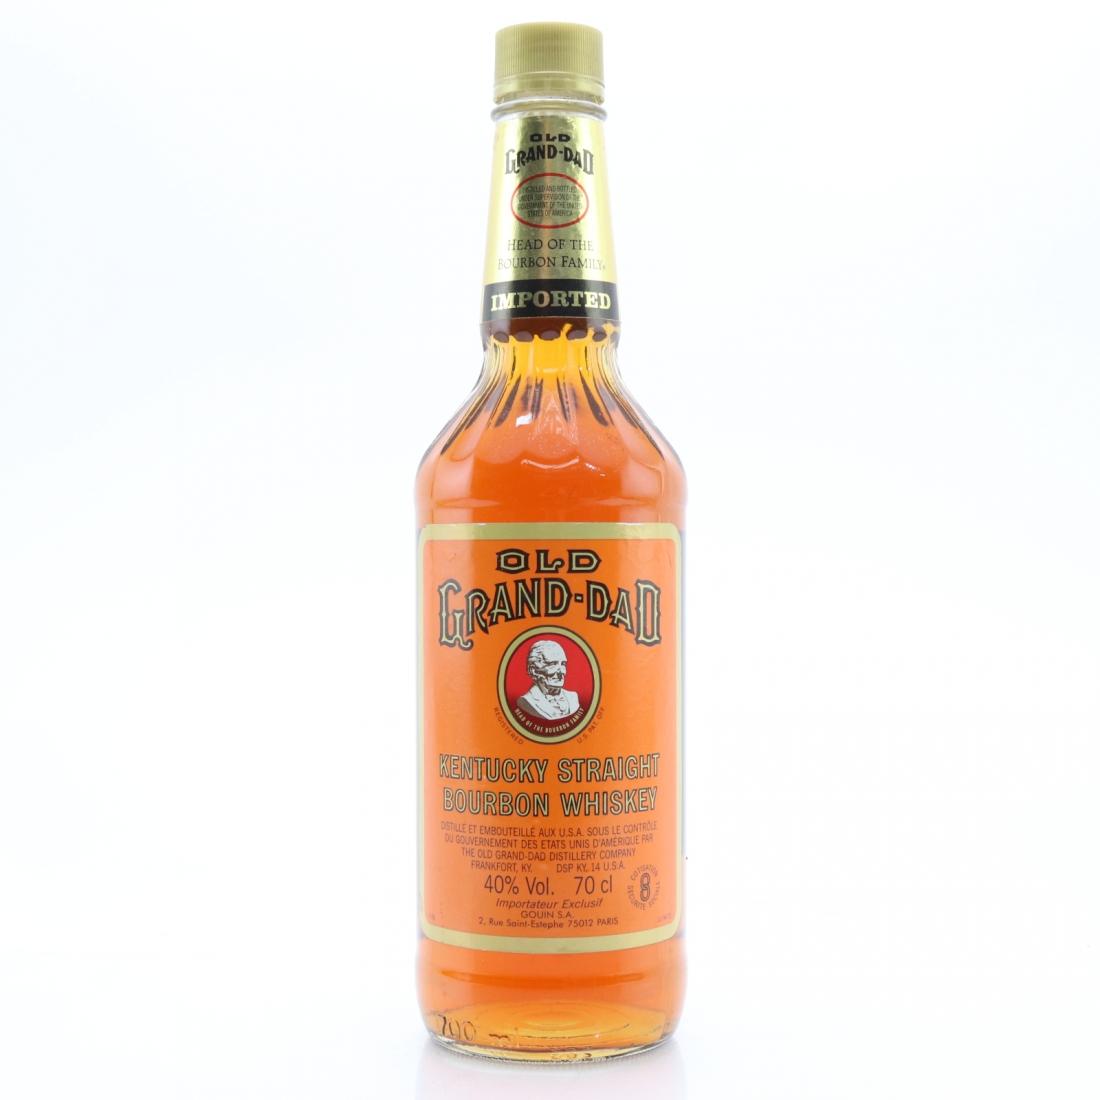 Old Grand-Dad Kentucky Straight Bourbon